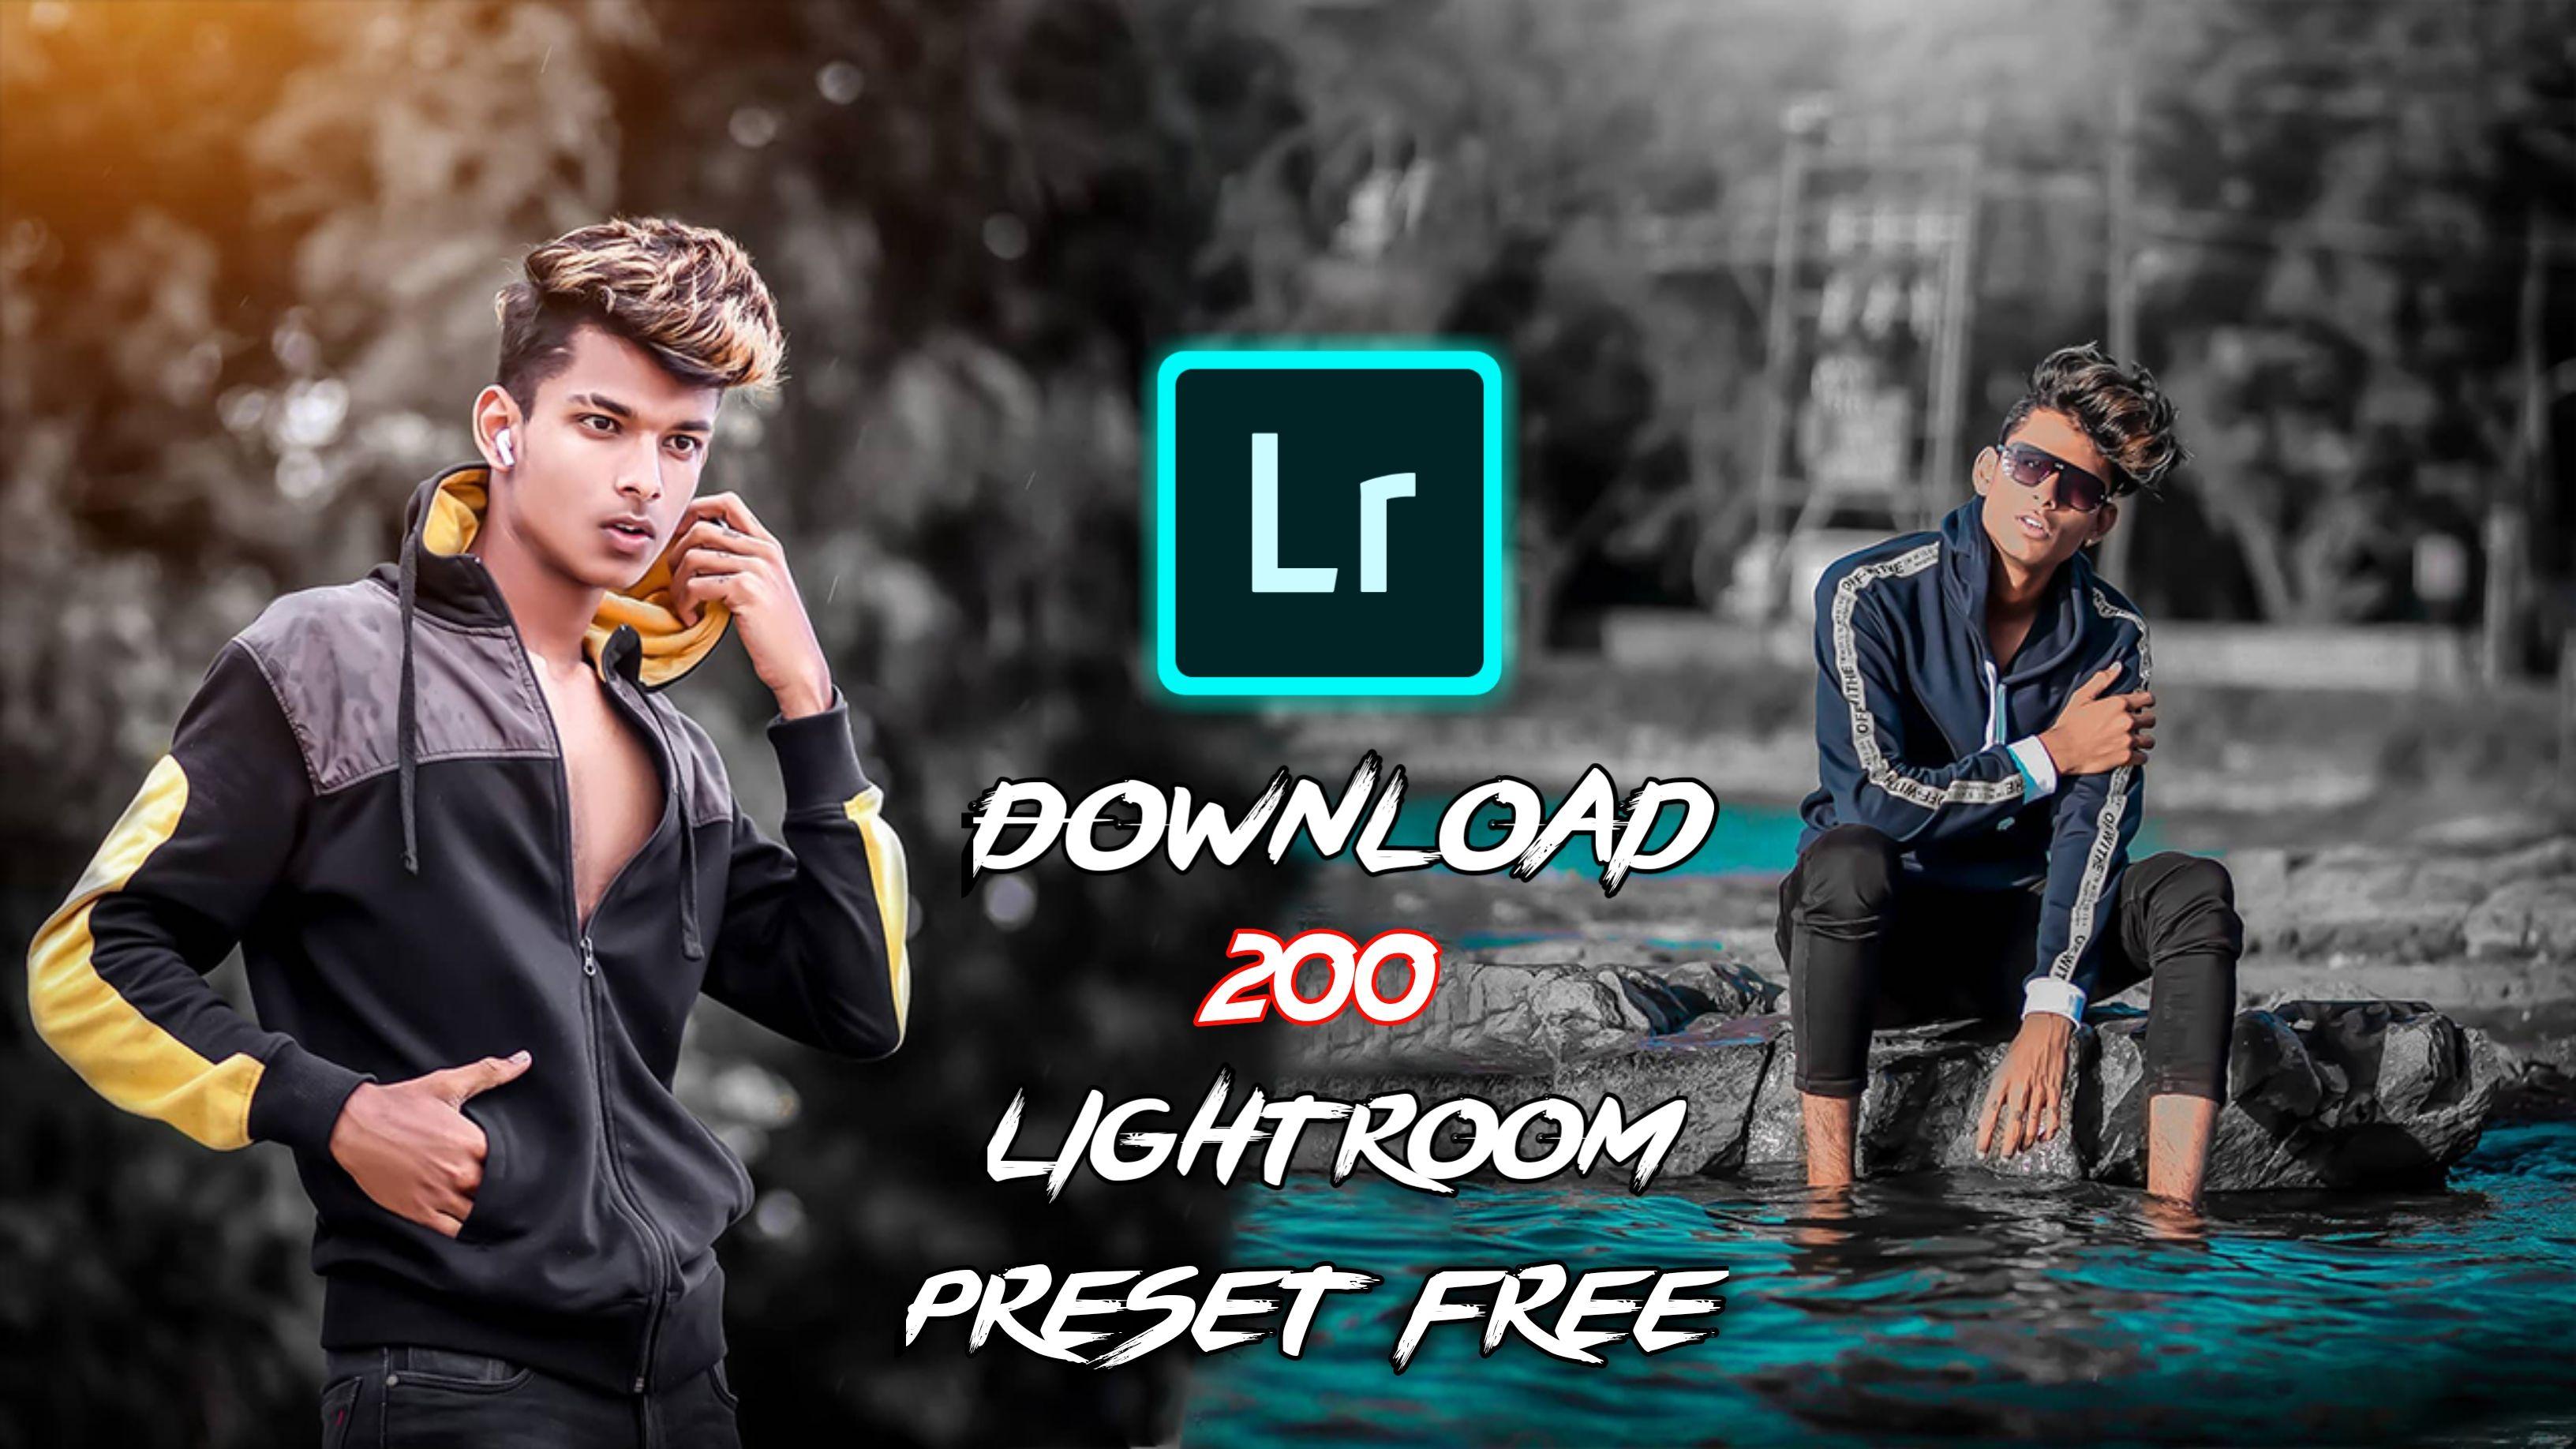 Lightroom Mobile 200 Presets Free Download In 1 Click In Hindi Lightroom Best Free Lightroom Presets Lightroom Presets For Portraits Lightroom Presets Free